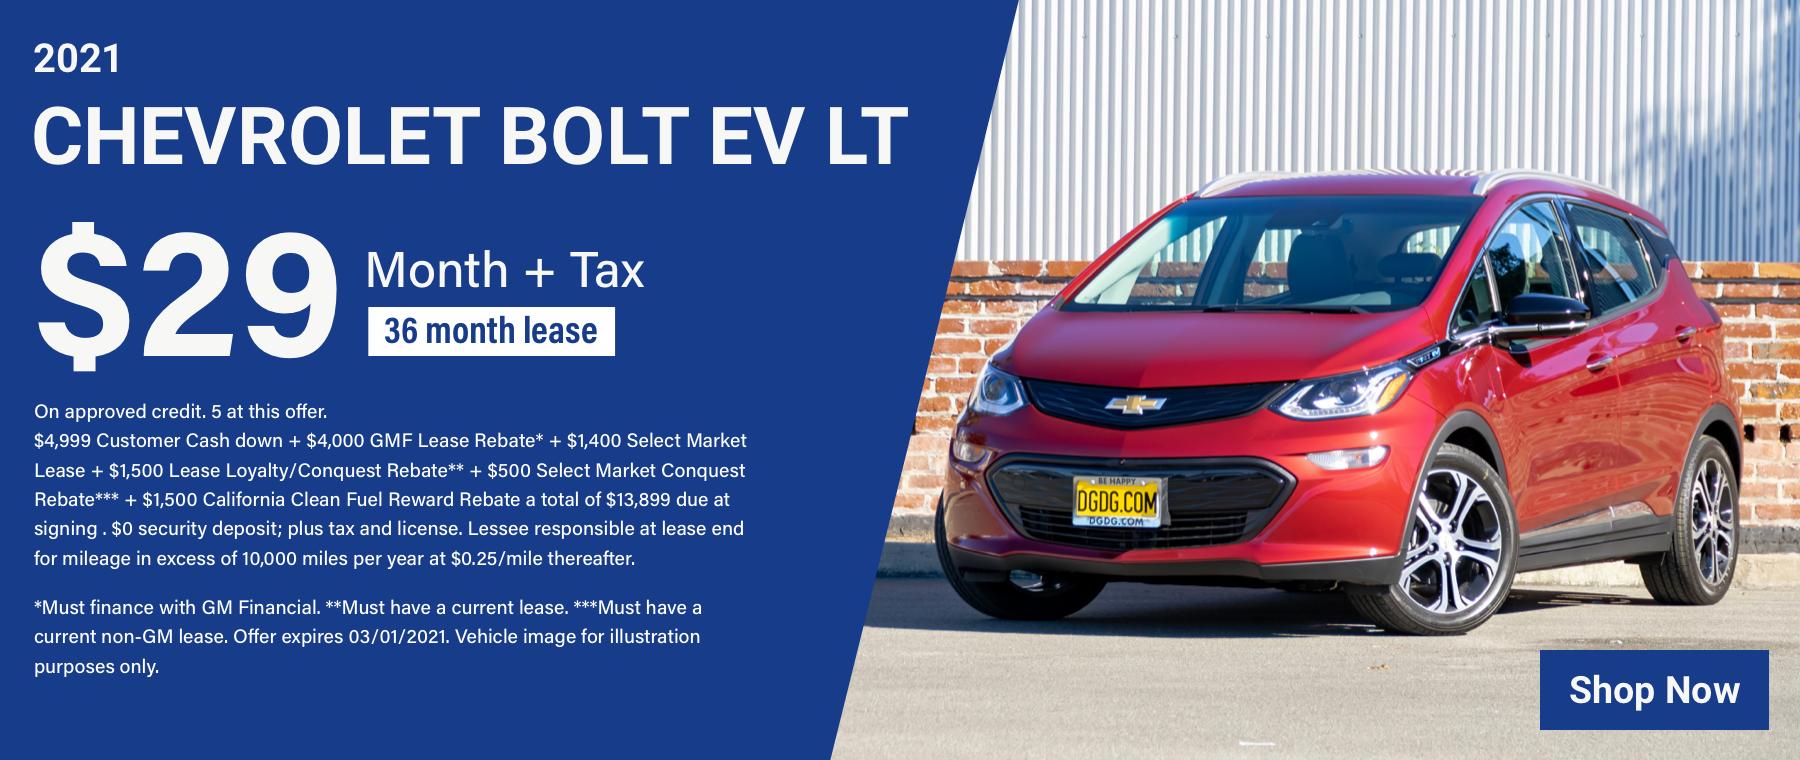 L – 2021 Chevy Bolt EV LT – $29mo Revised 4